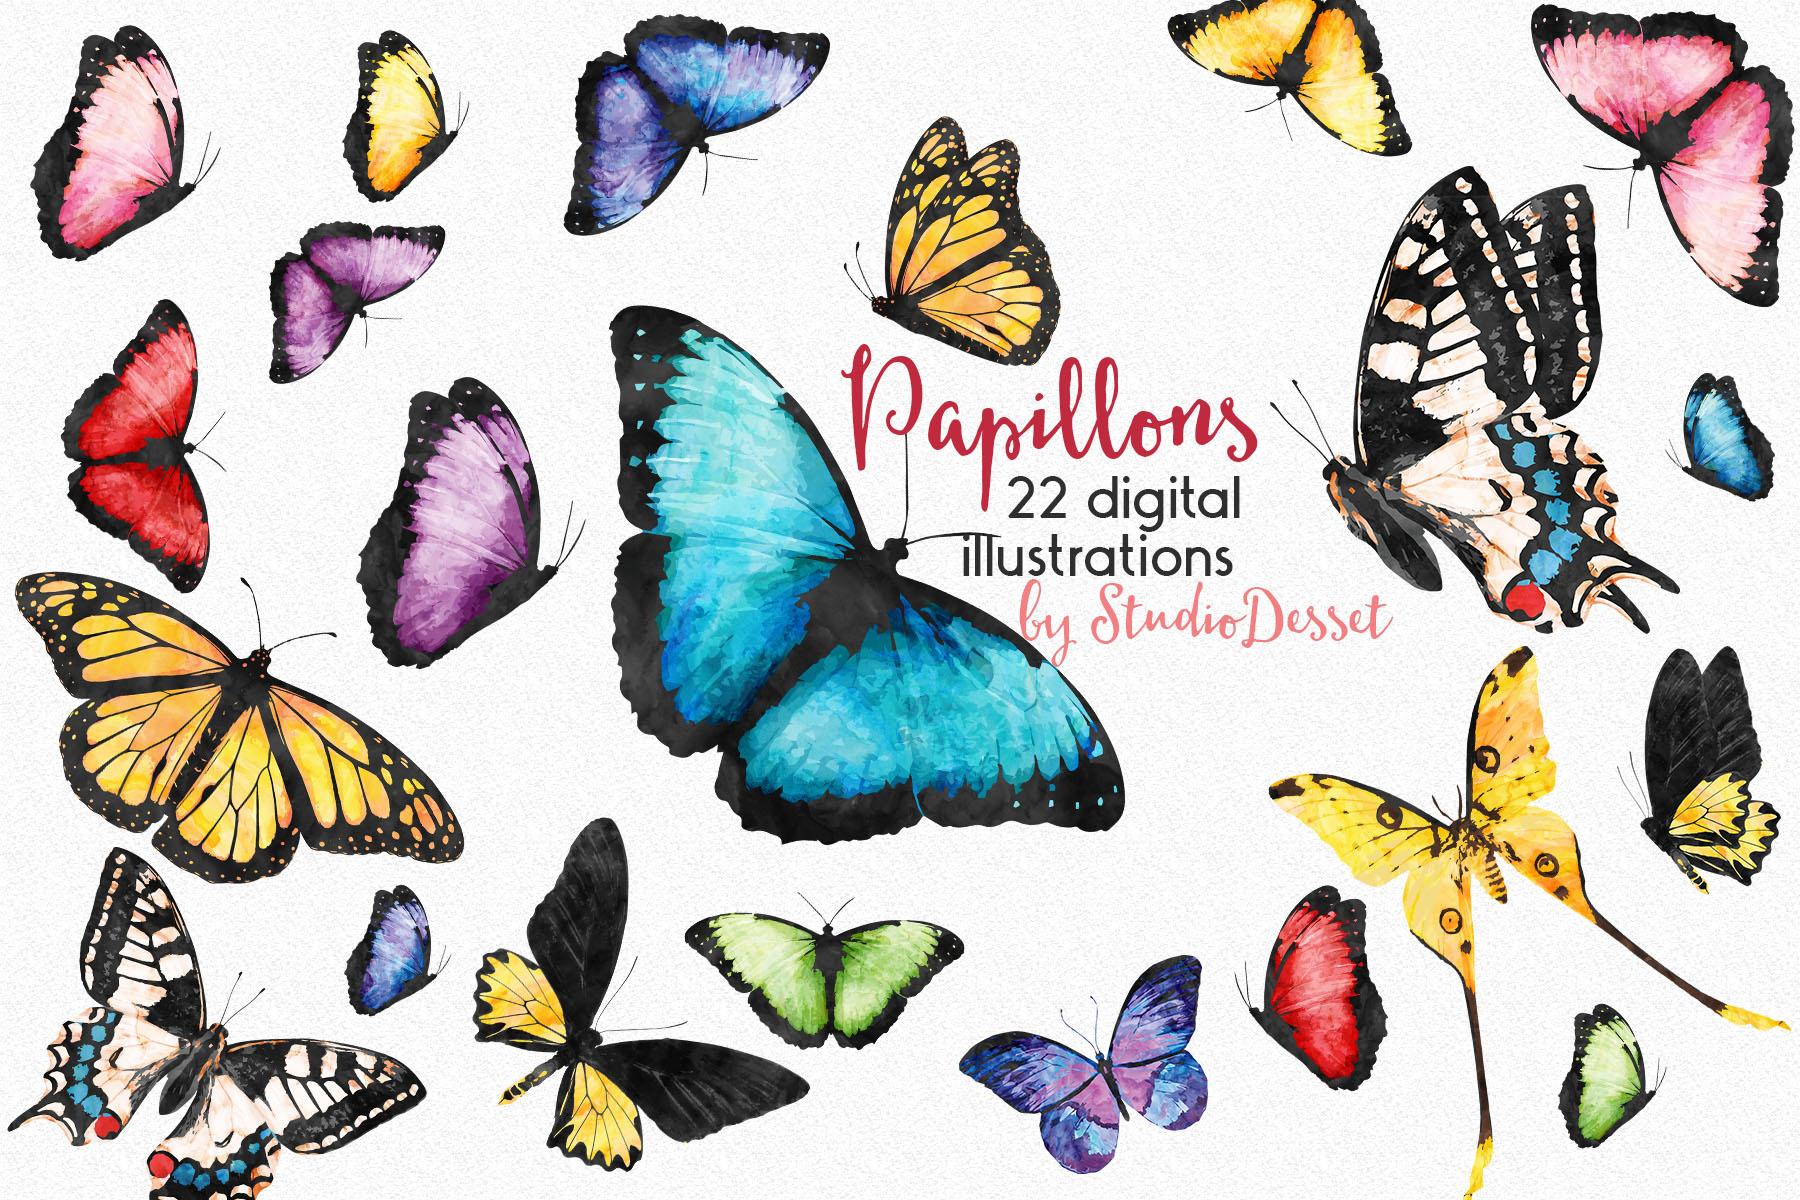 Spring Bundle of Illustrations & Patterns - Sublimation PNG example image 4